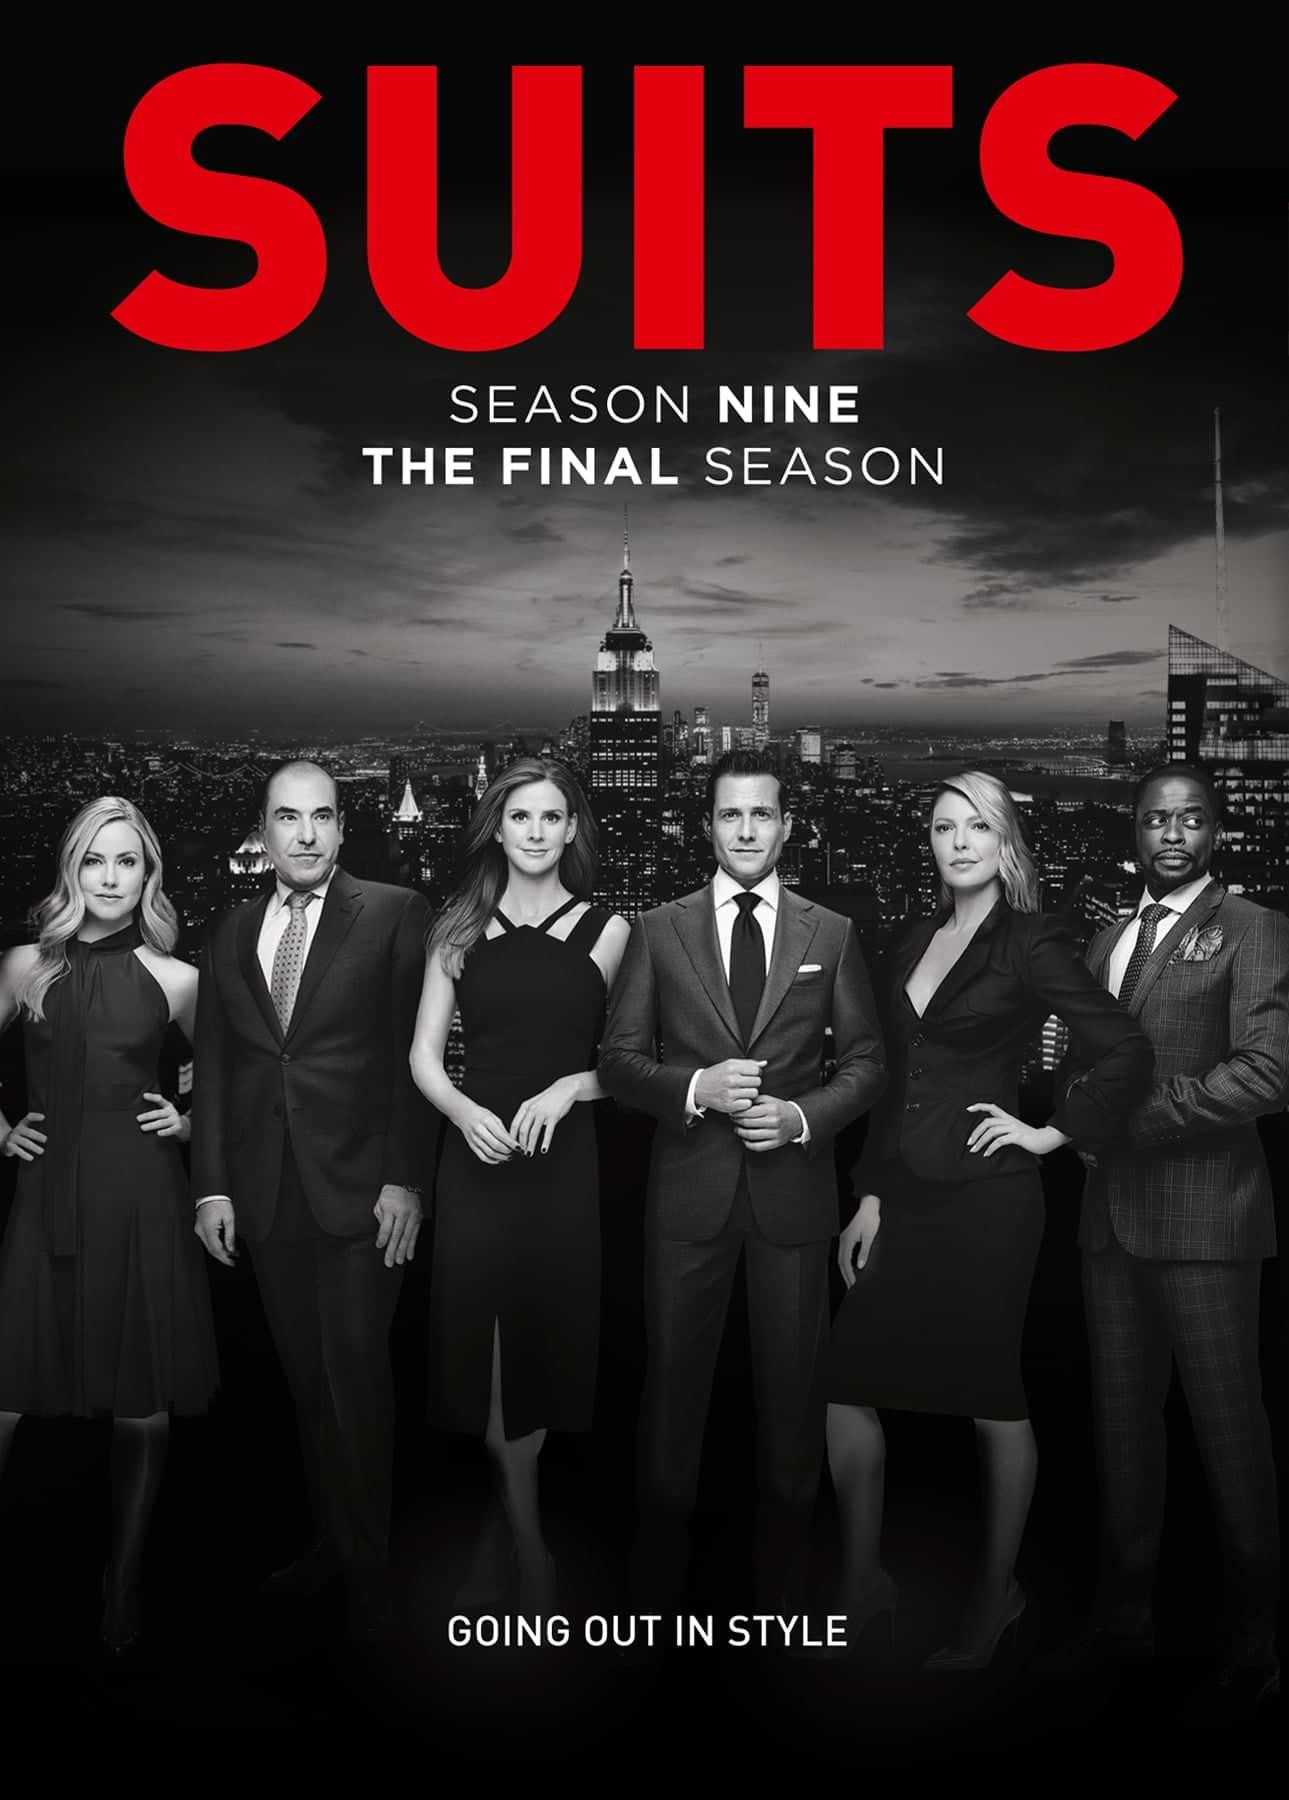 Suits Season 9 (2019) สูท ปี 9 ซับไทย EP1 – EP10 [จบ]